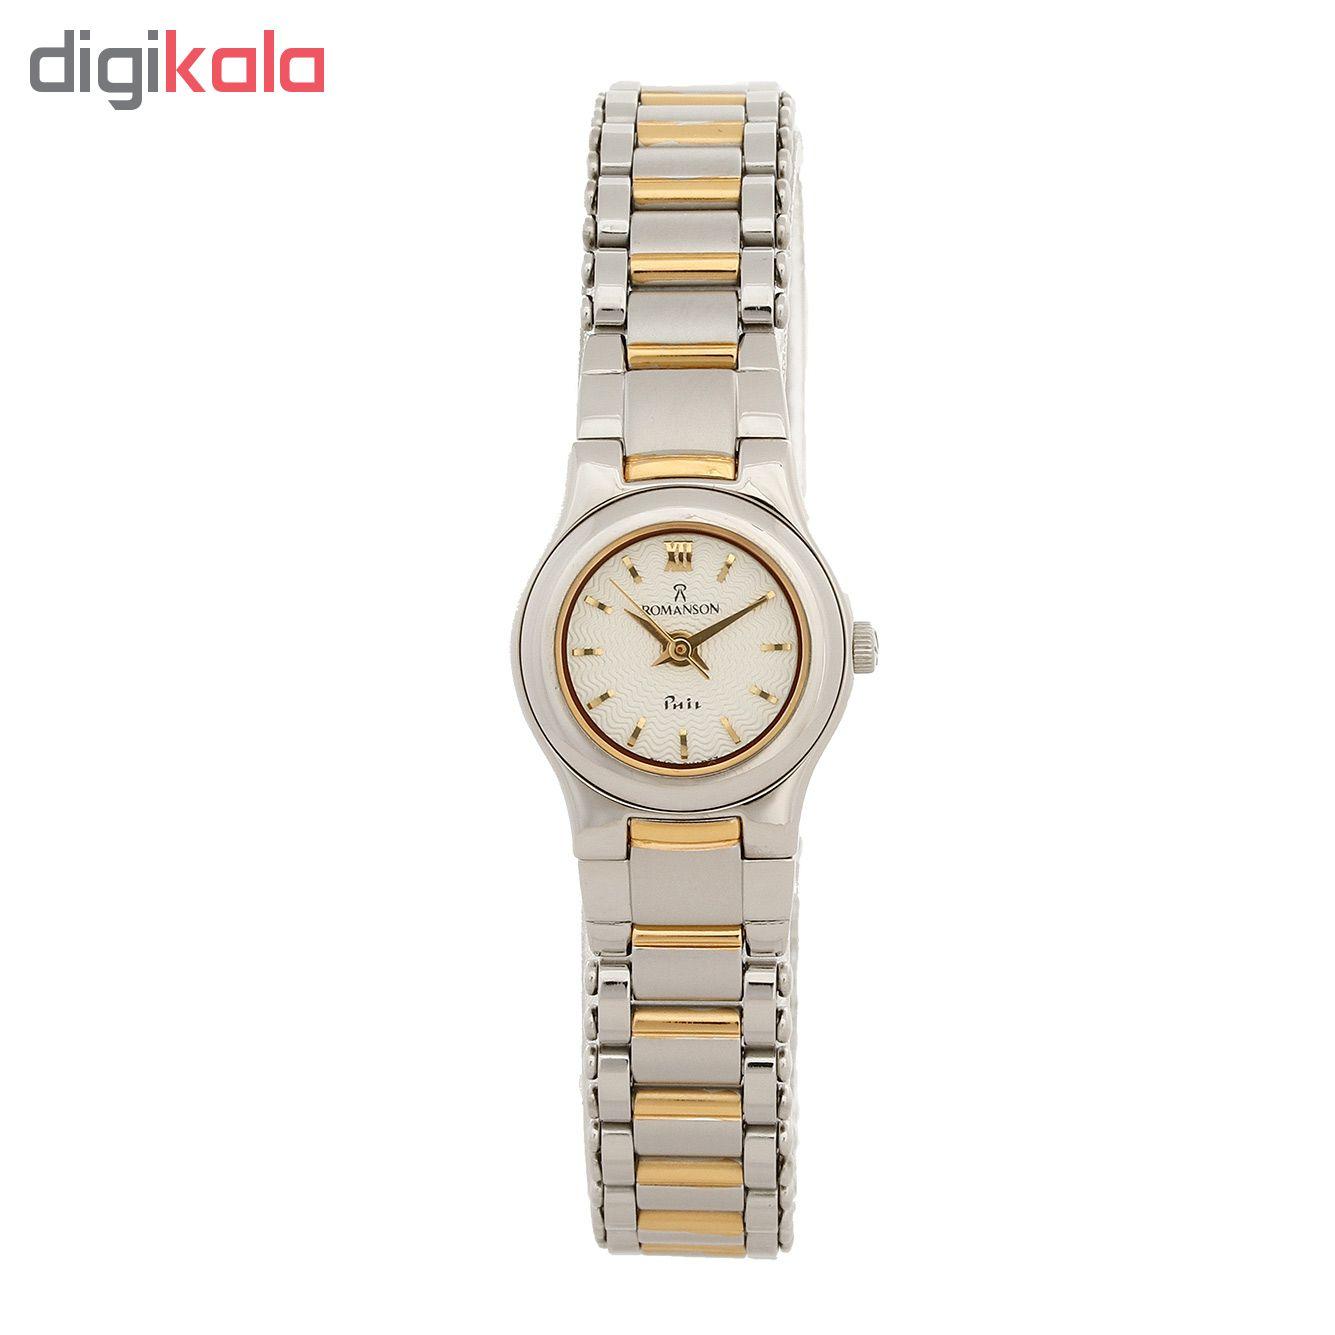 ساعت مچی عقربه ای زنانه رومانسون مدل NM4510LL1CAS1G